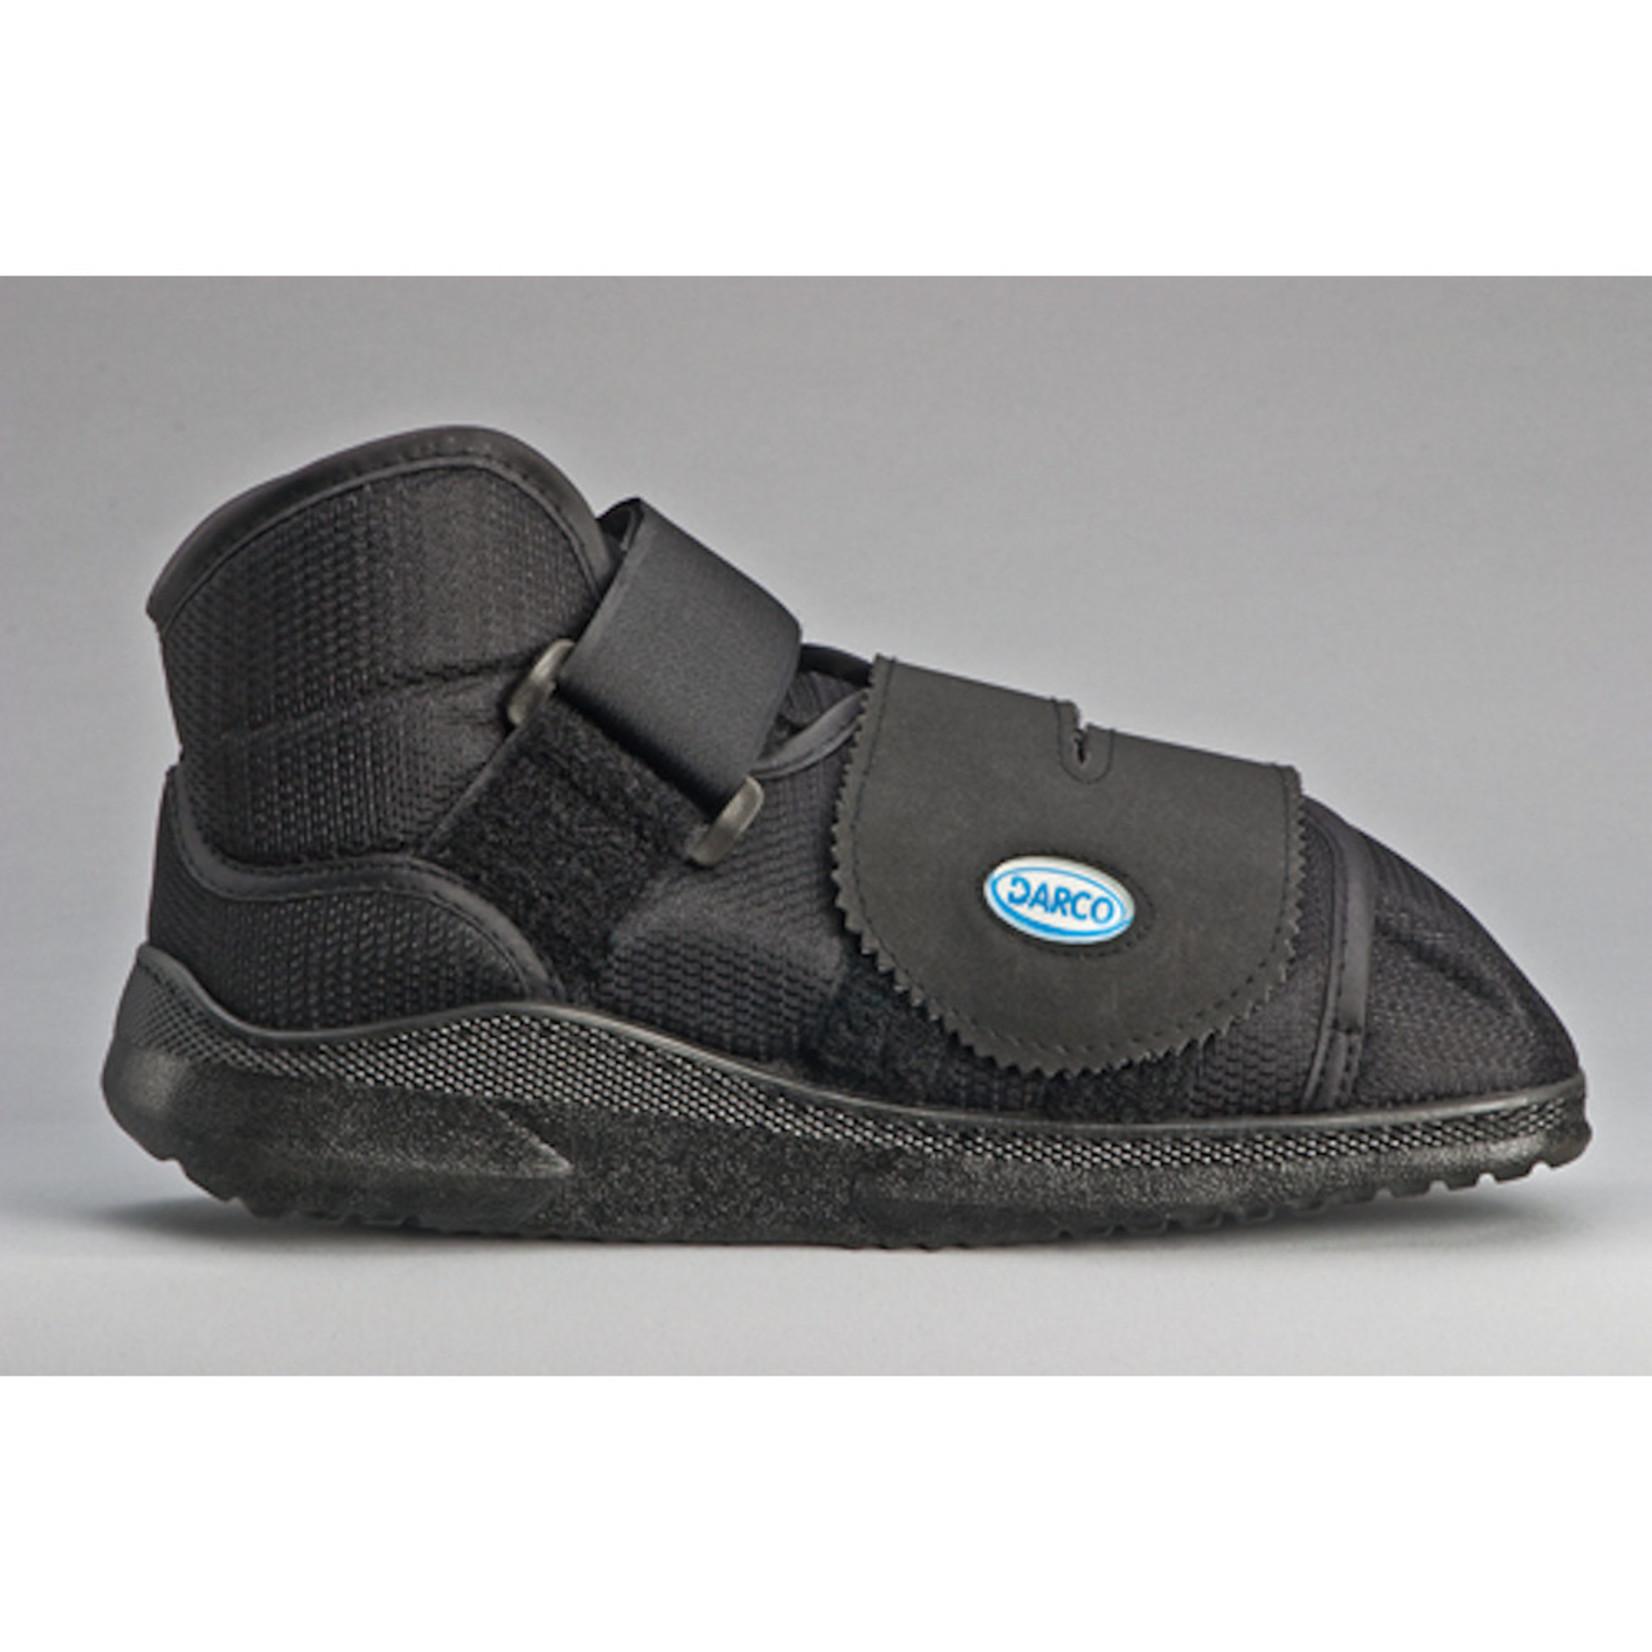 Darco All Purpose Shoe - Extra Small